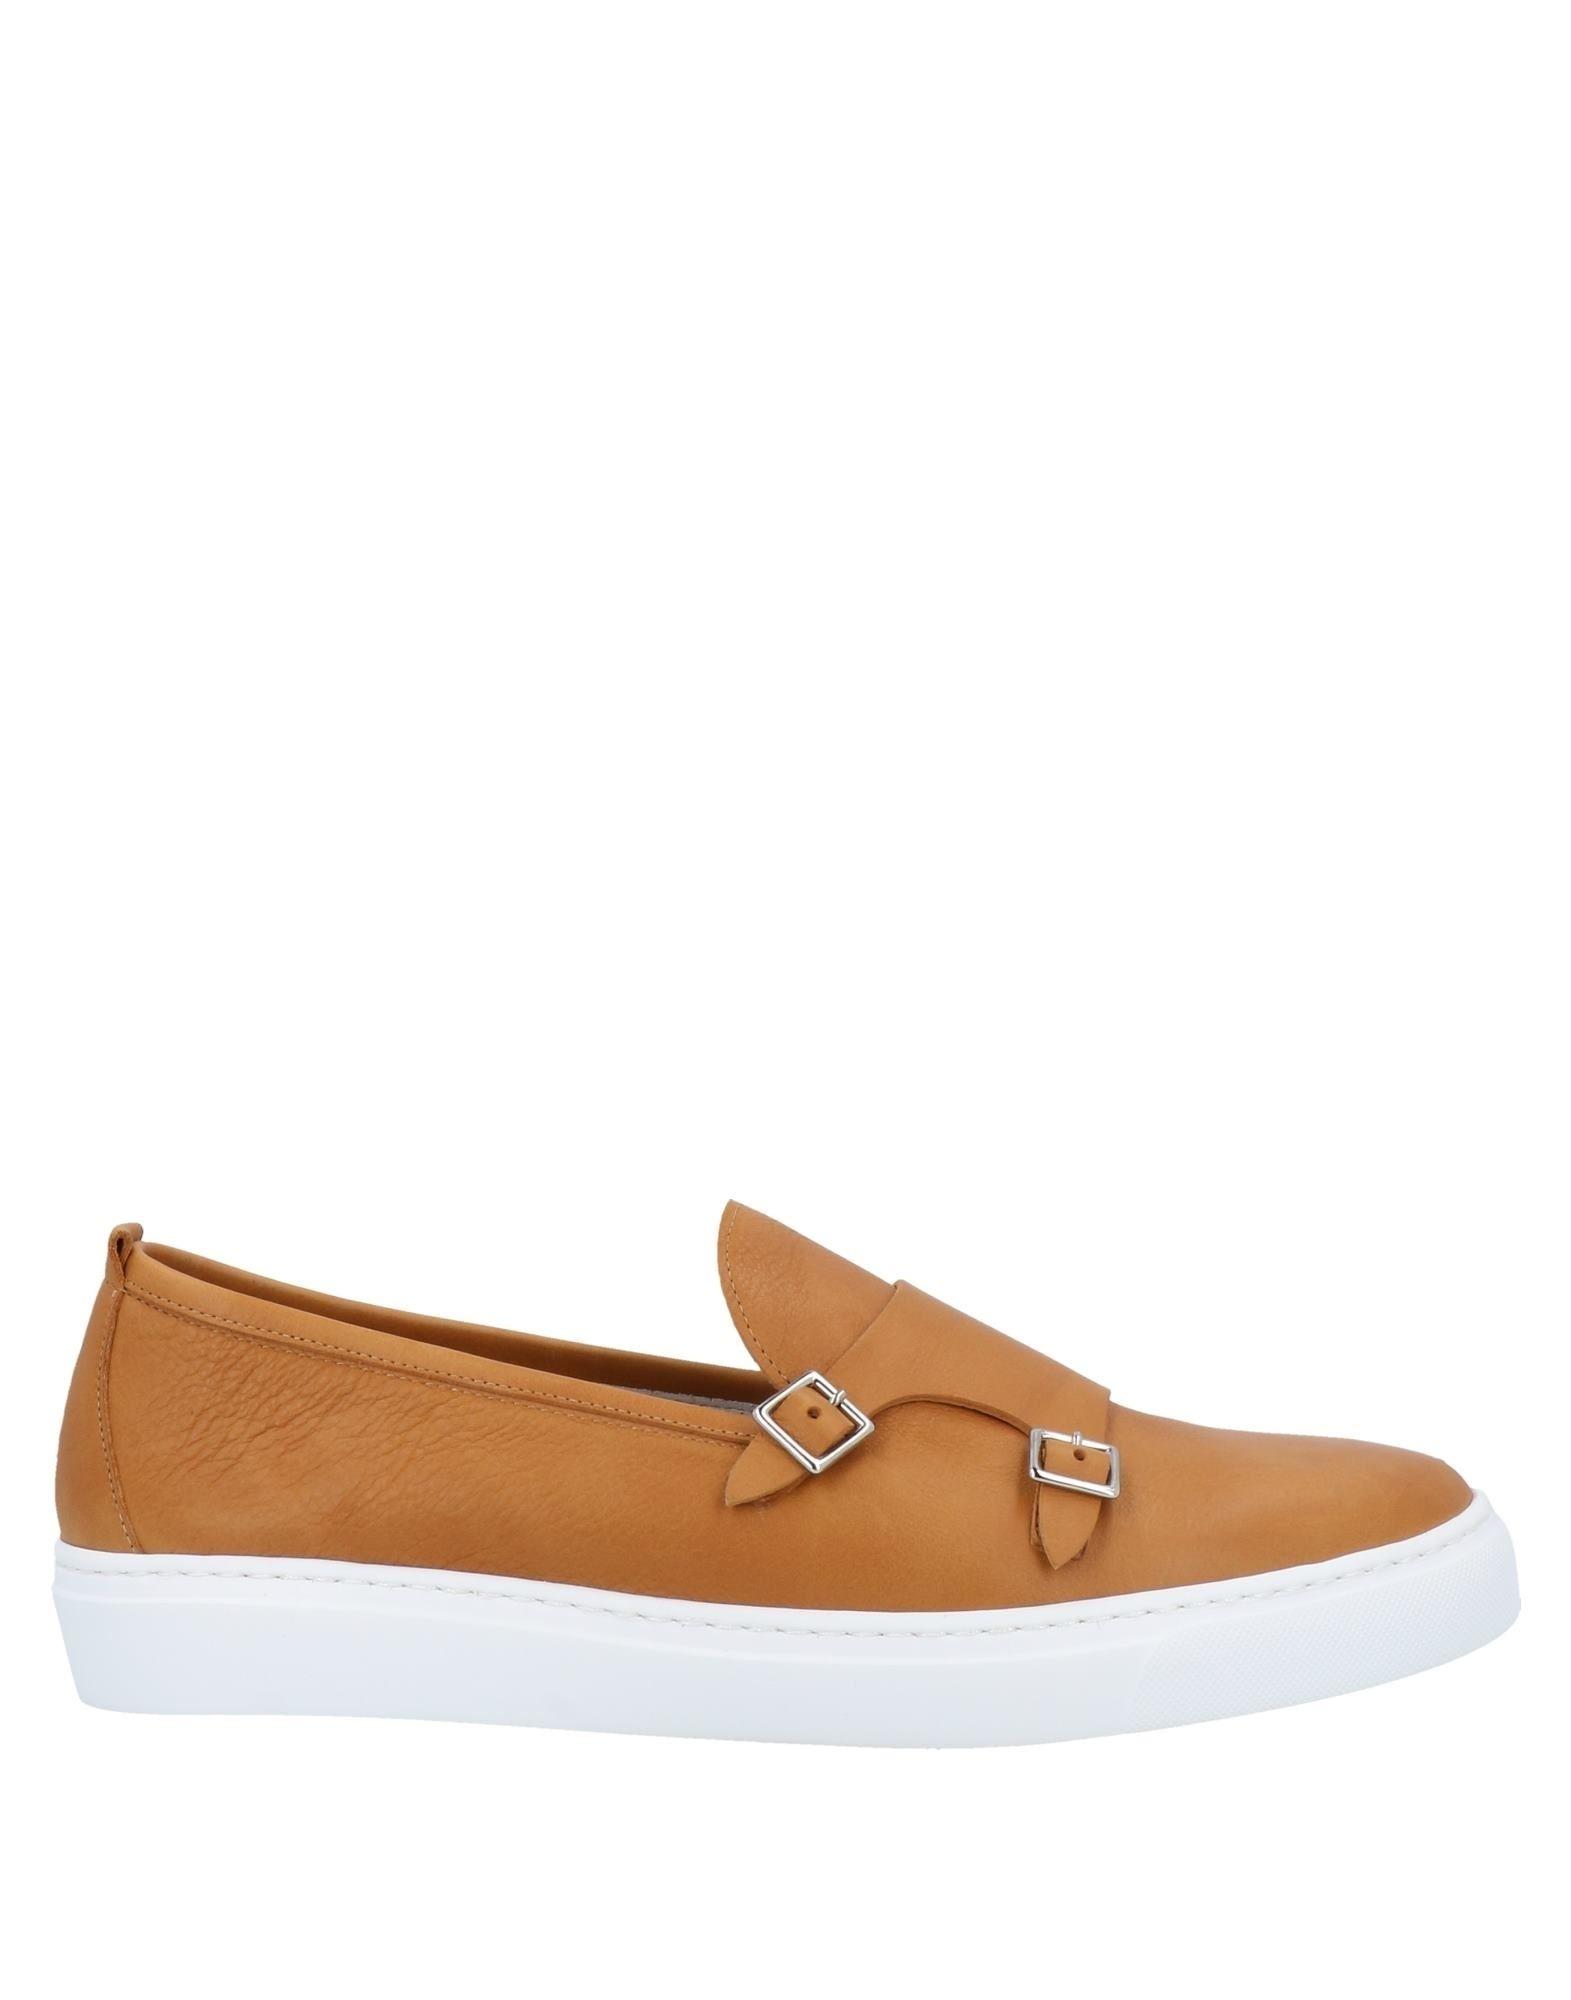 Henderson Baracco Sneakers In Tan